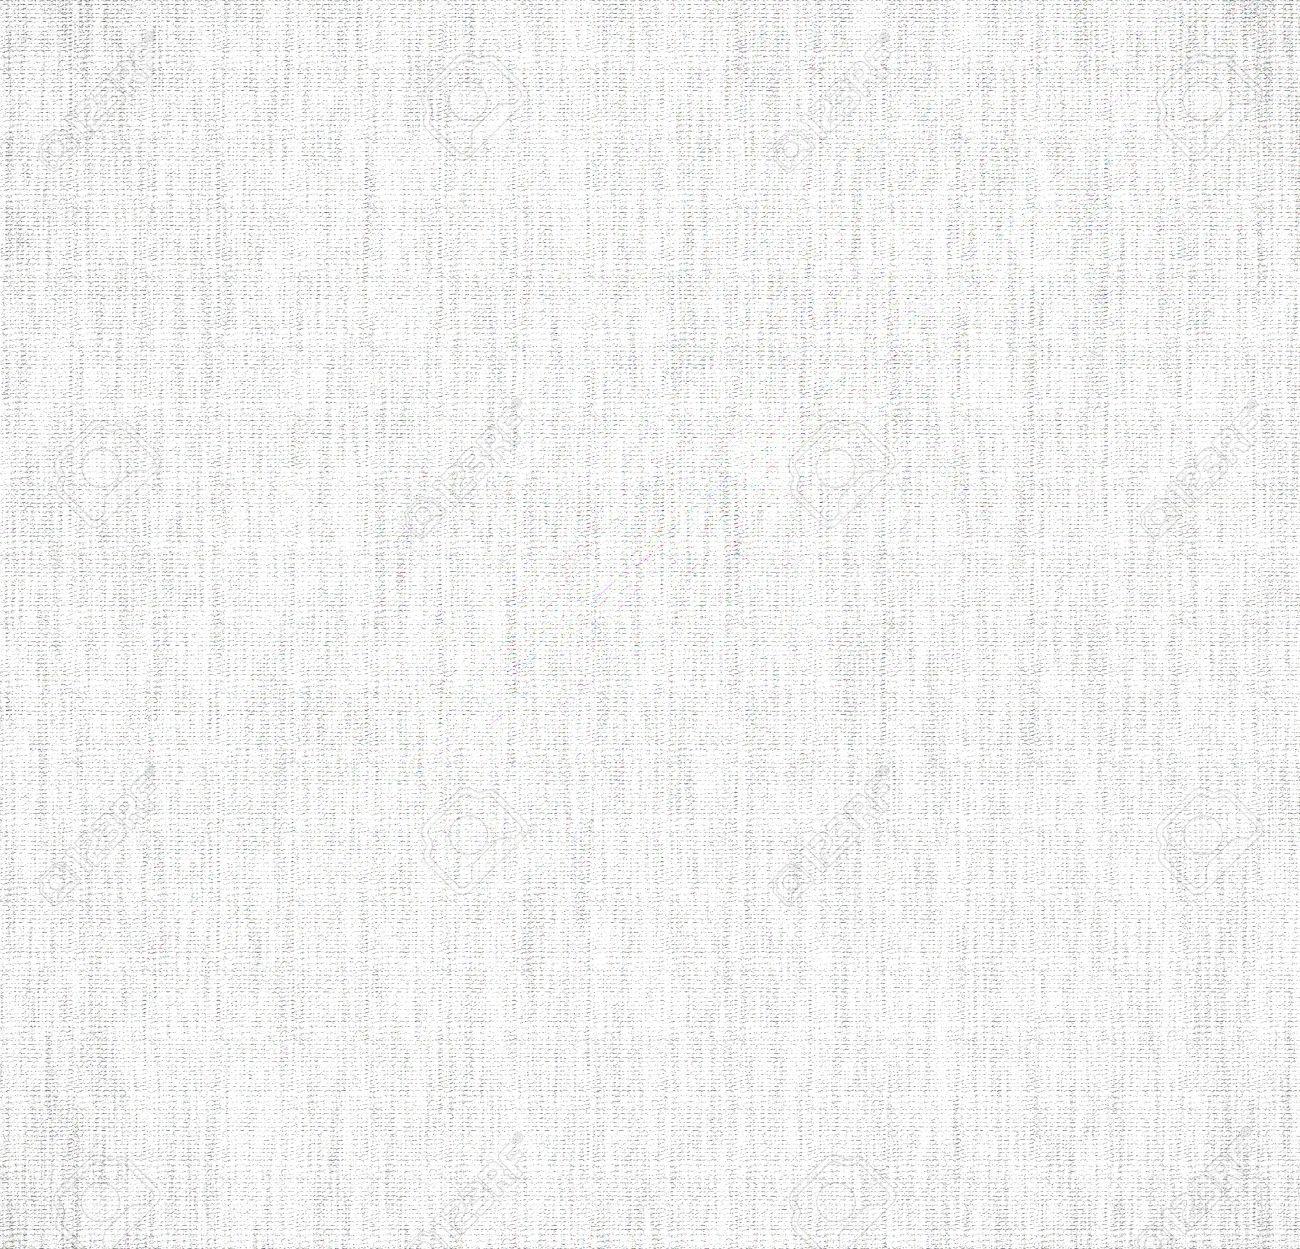 fabric sheet texture. grey fabric sheet of paper as a texture stock photo - 20331799 123rf photos